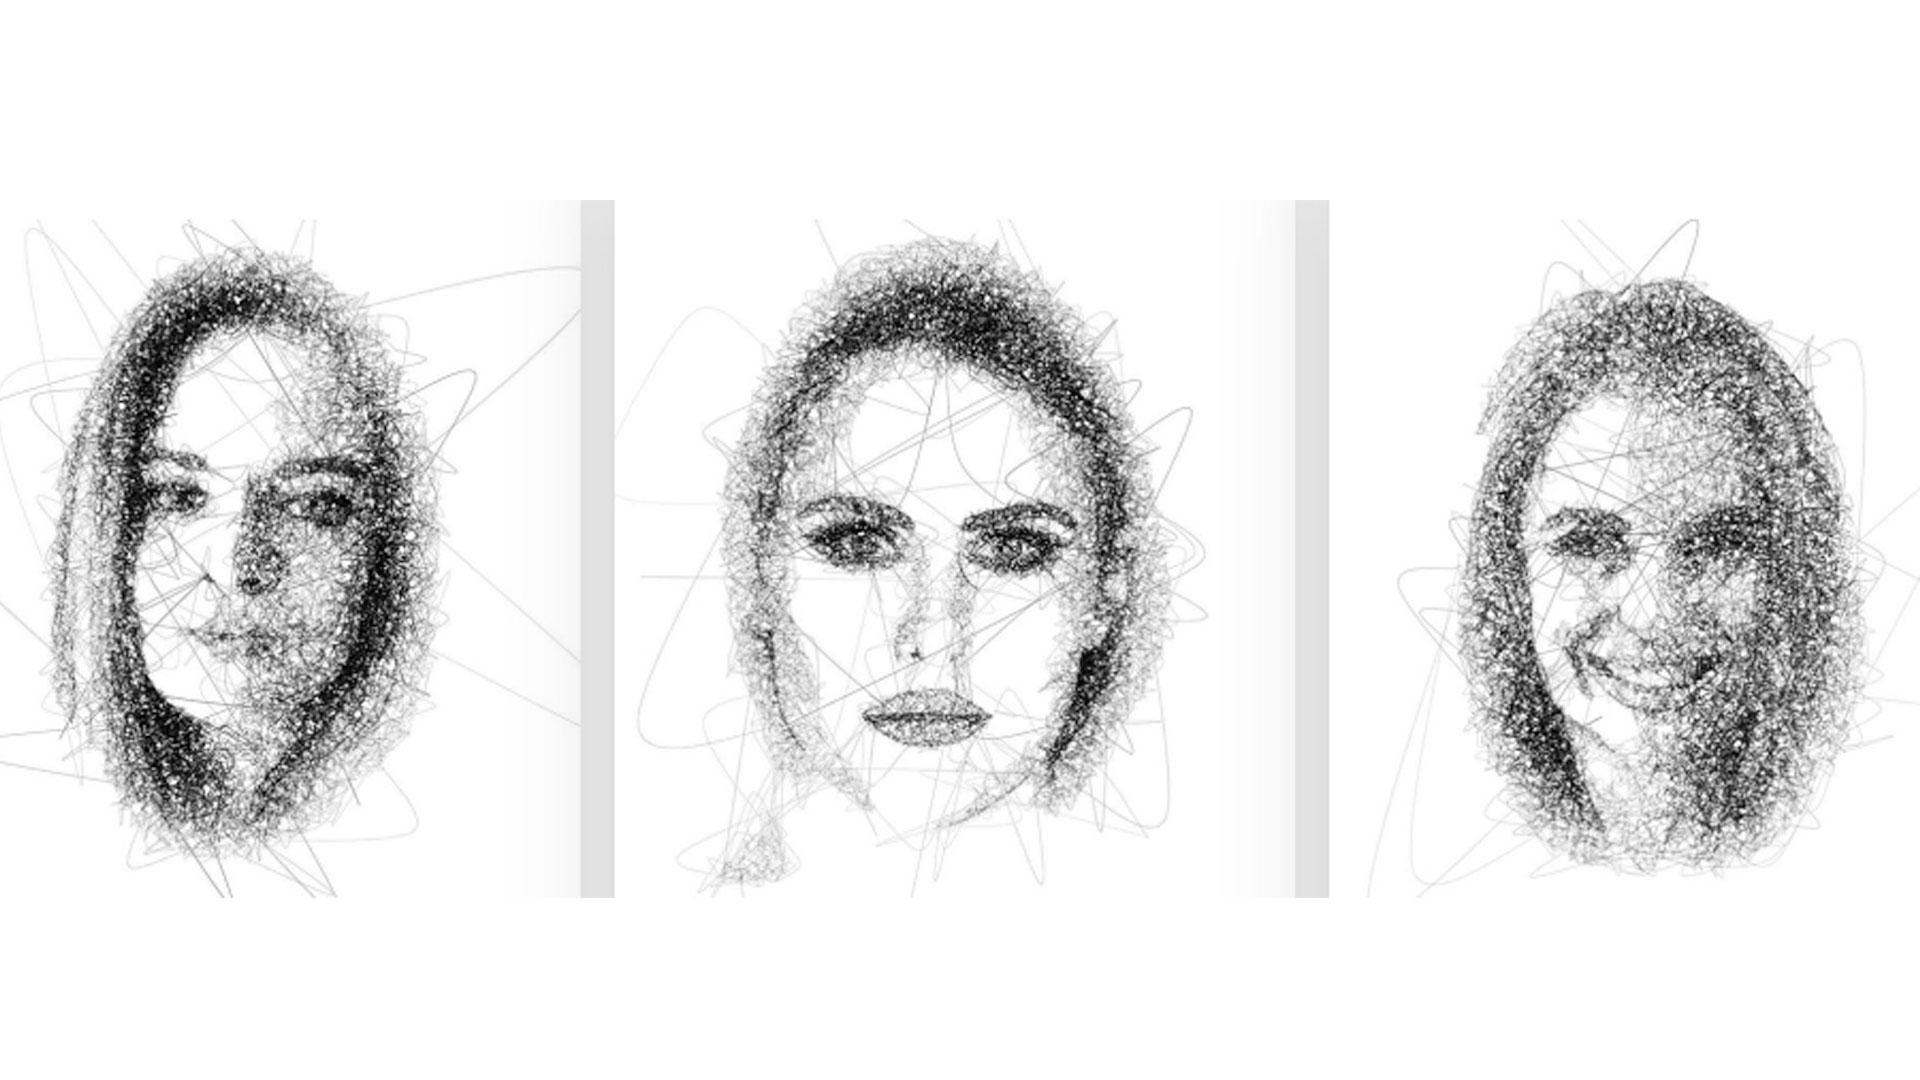 ultravioletto_mercedes_robot_drawings_ritratti